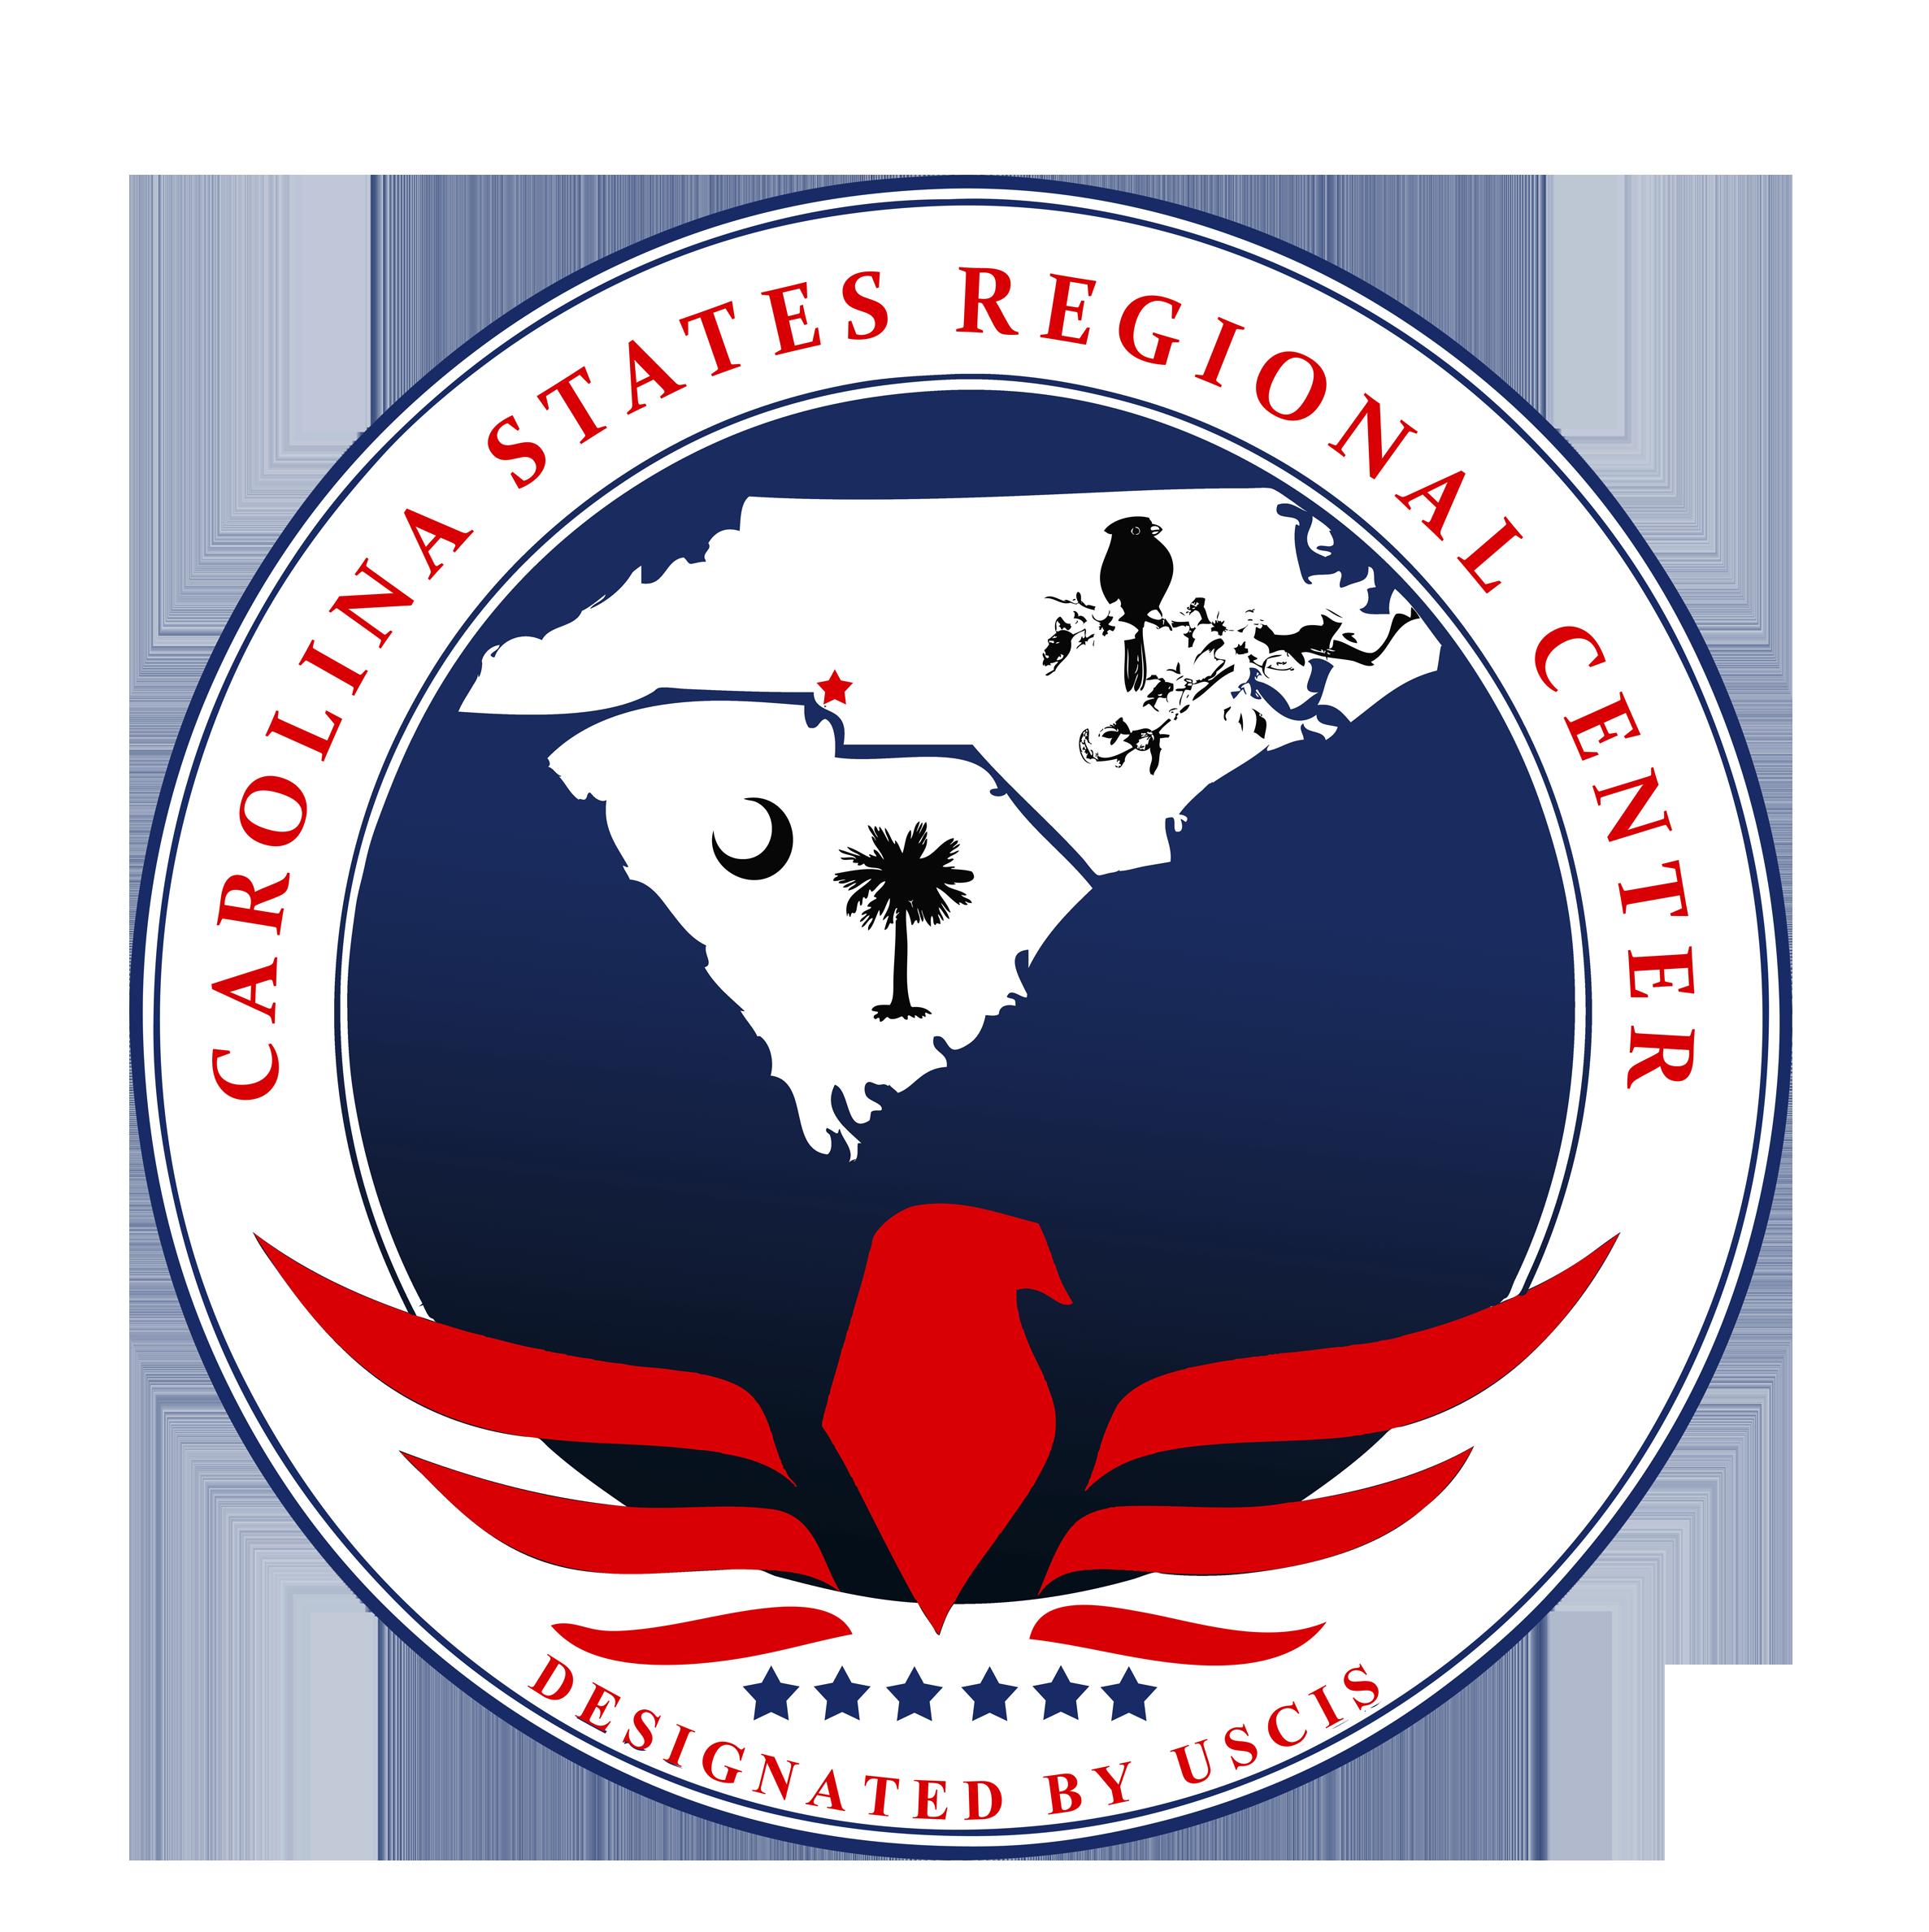 Carolina States Regional Center